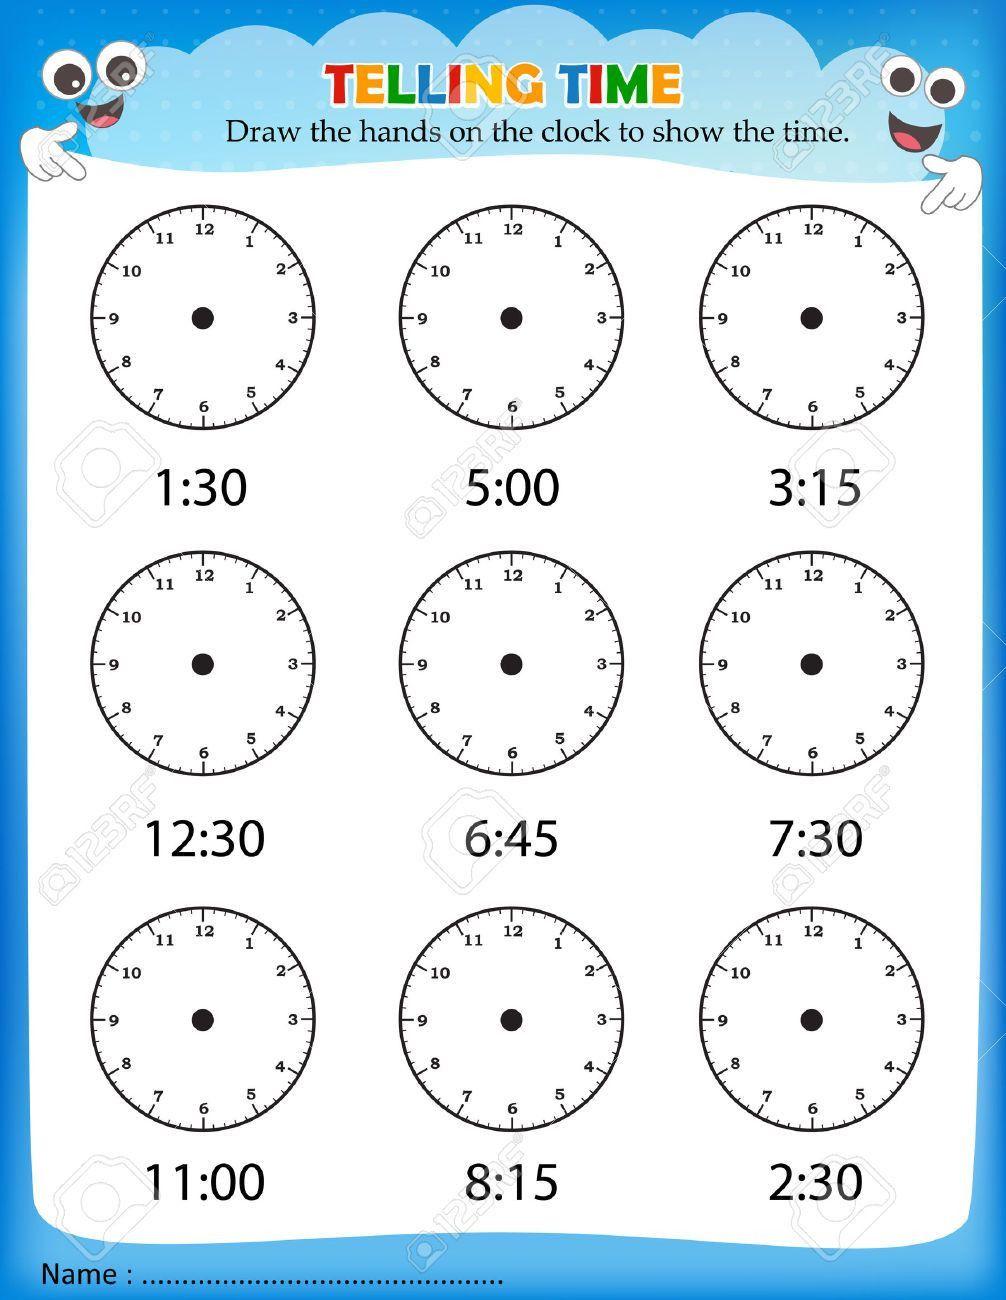 3 Free Elapsed Time Worksheets For Kids Image Result For Time Worksheet For Kindergarten In 2020 Time Worksheets Free Printable Math Worksheets Telling Time Worksheets